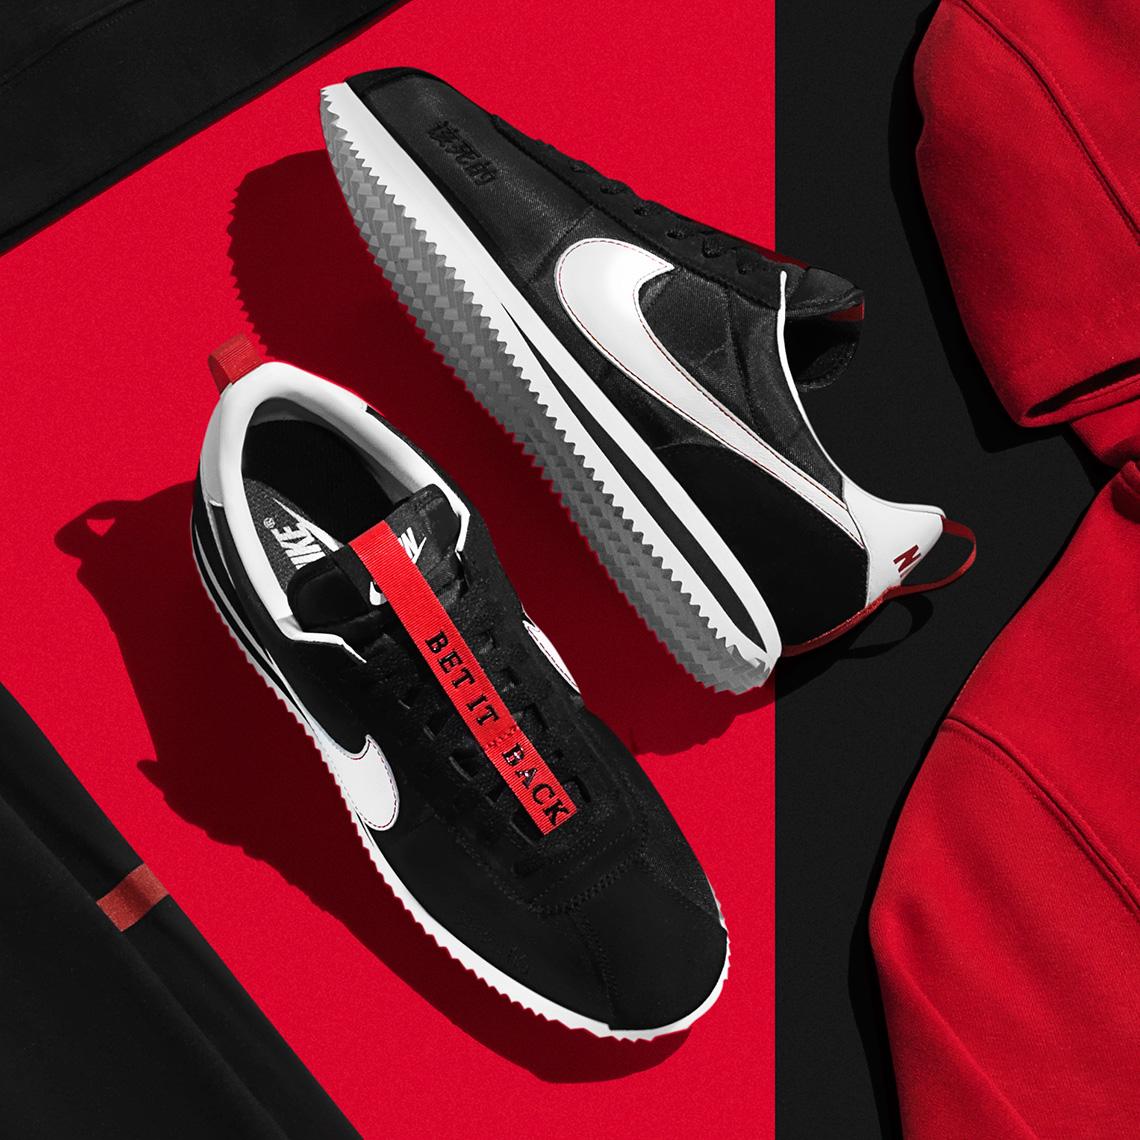 veinte bandera nacional estético  Where To Buy Nike Kendrick Lamar TDE The Championship Tour Merch Cortez |  SneakerNews.com